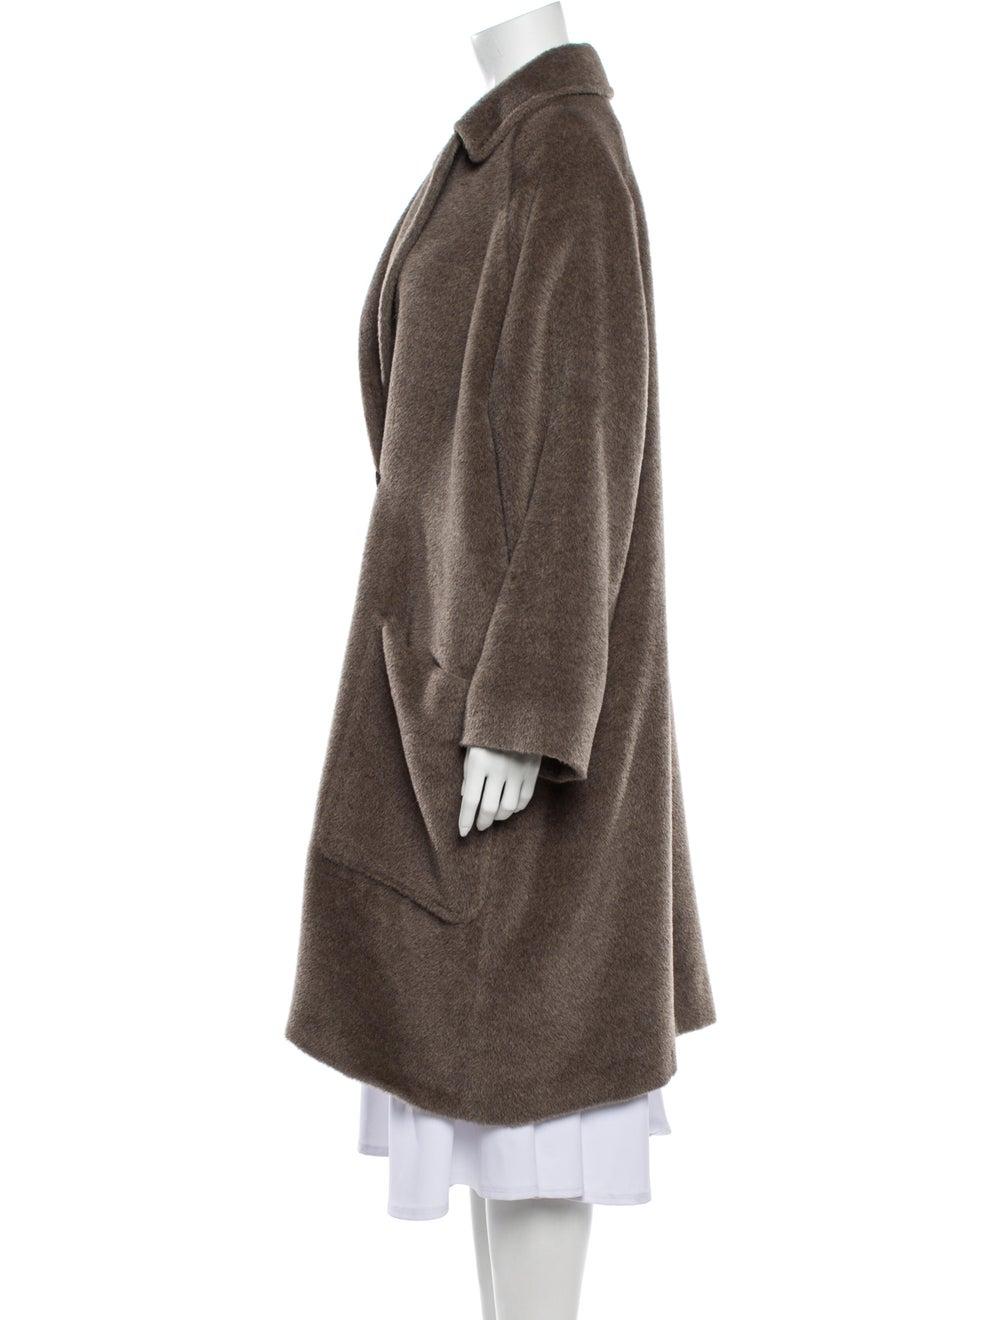 Max Mara Alpaca Coat - image 2